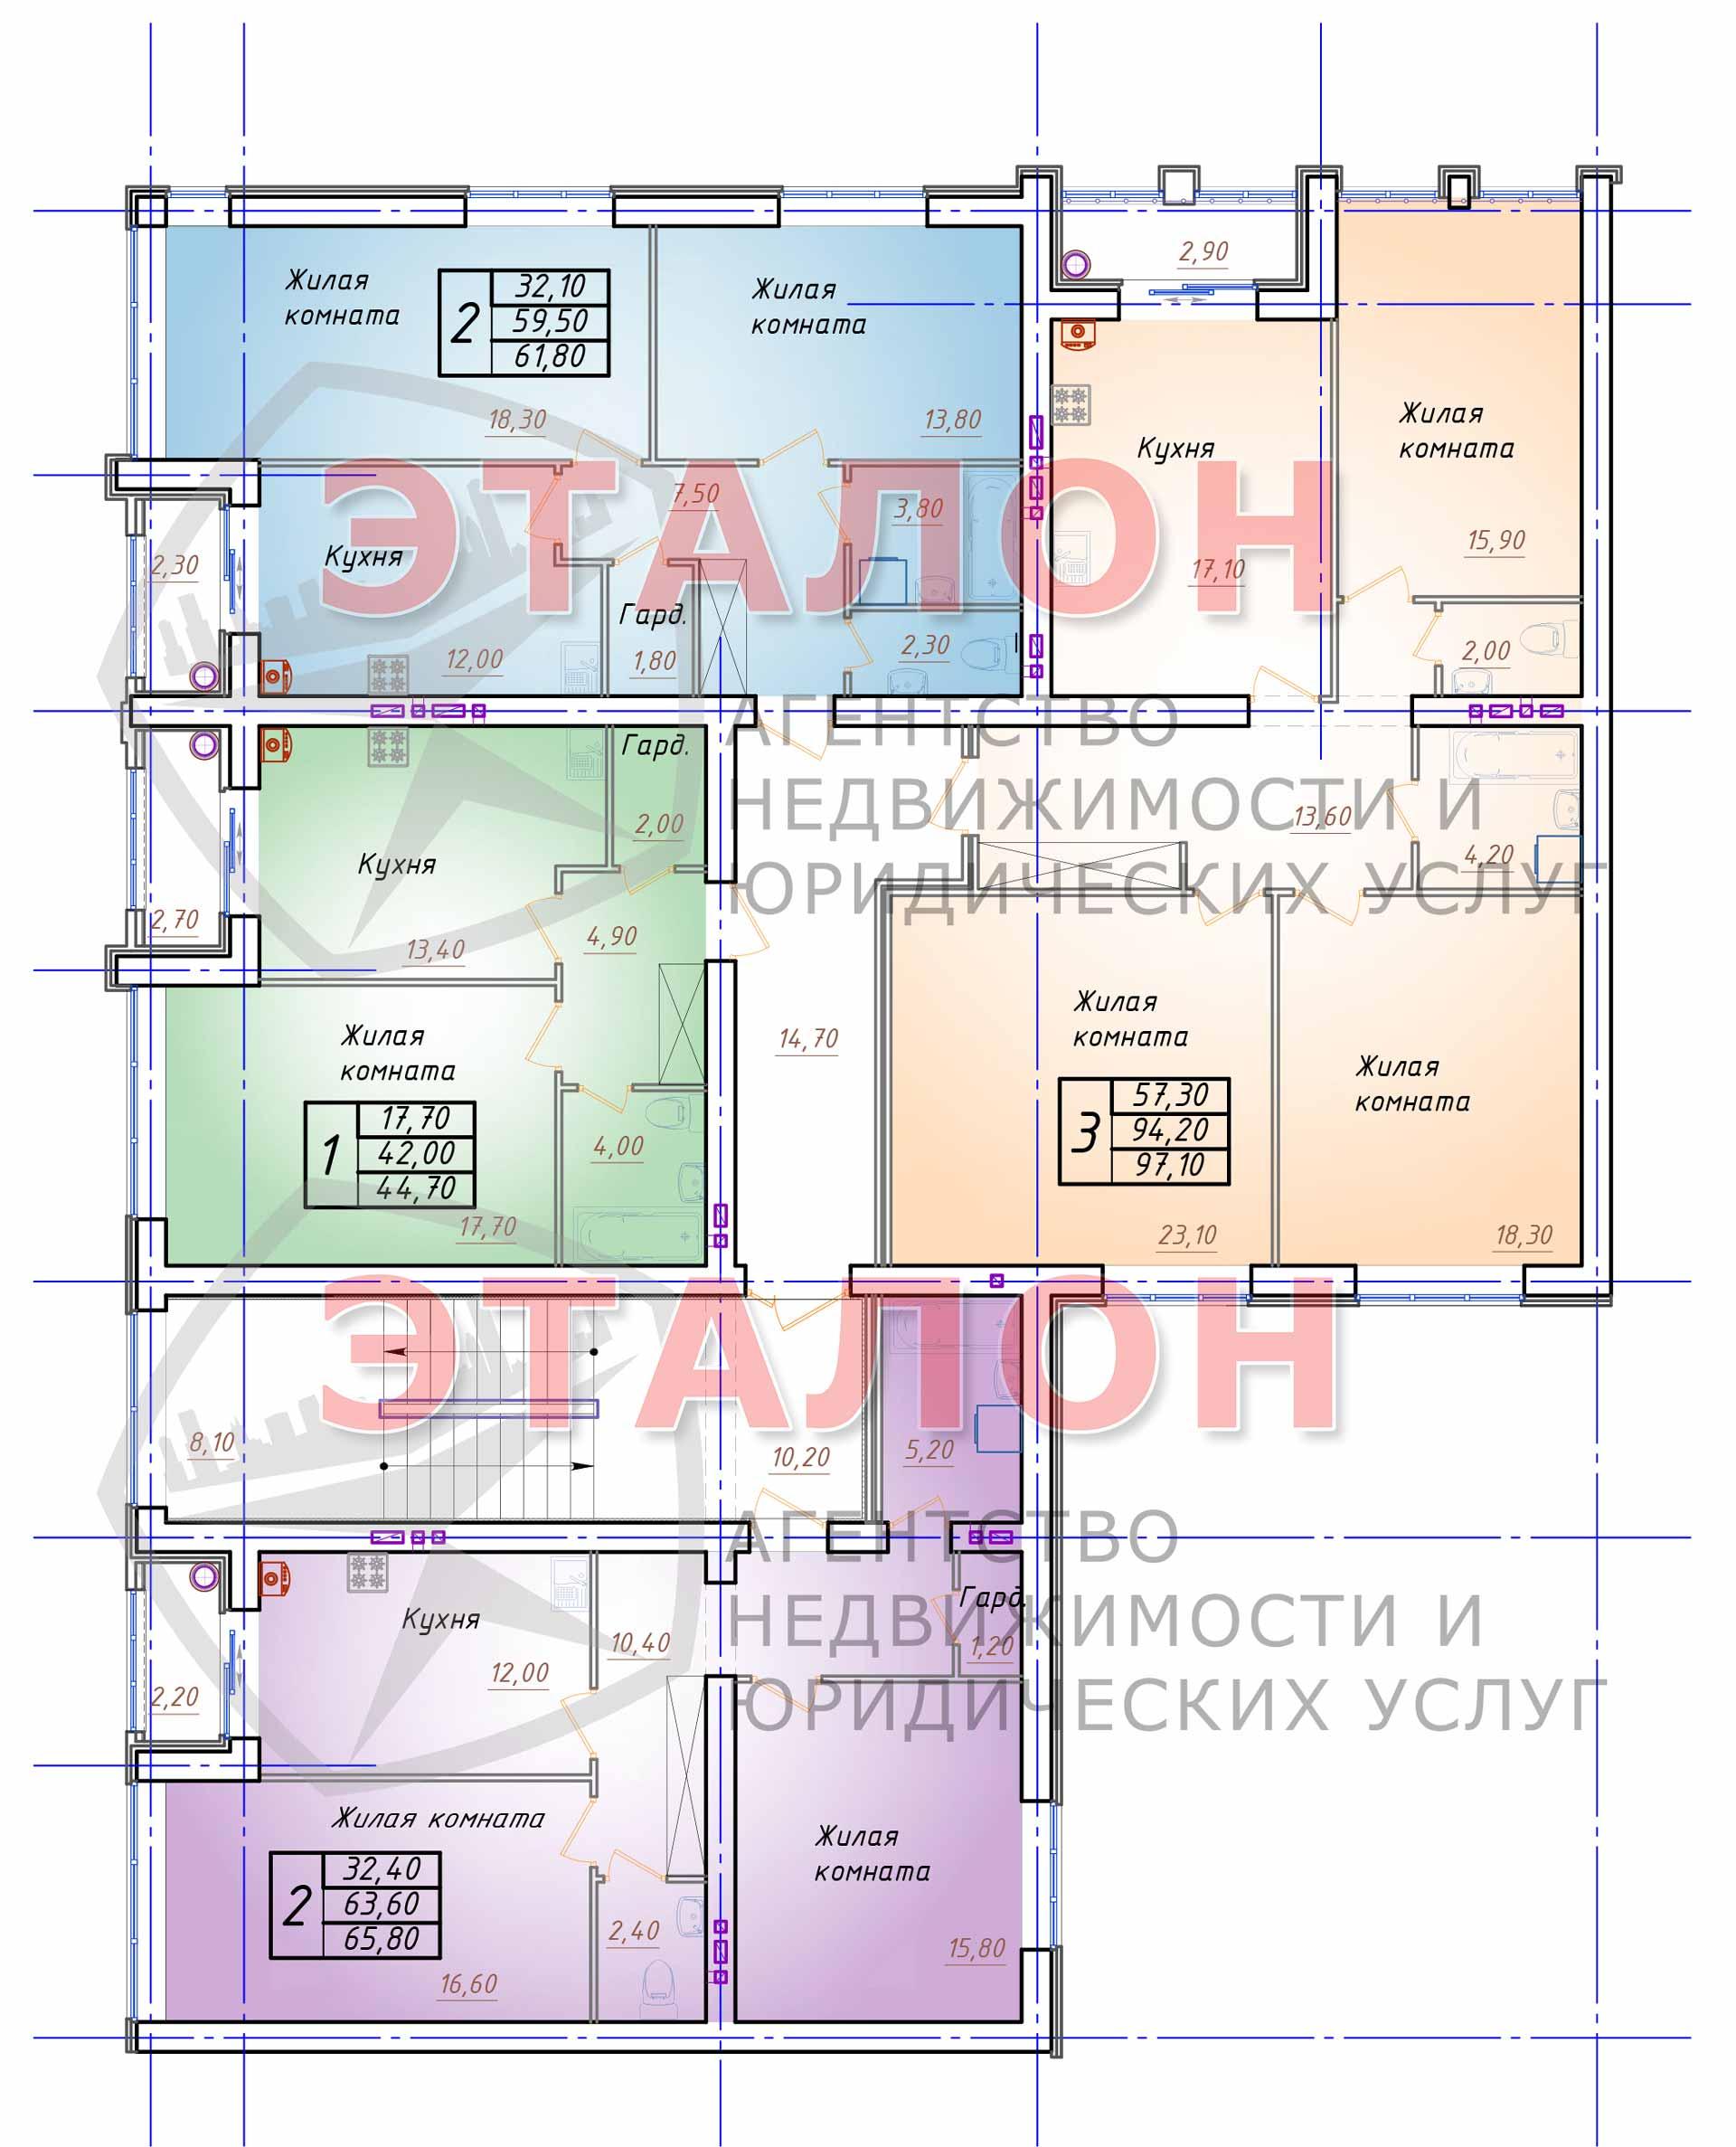 Блок 3. Подъезд 3. План 2-го этажа